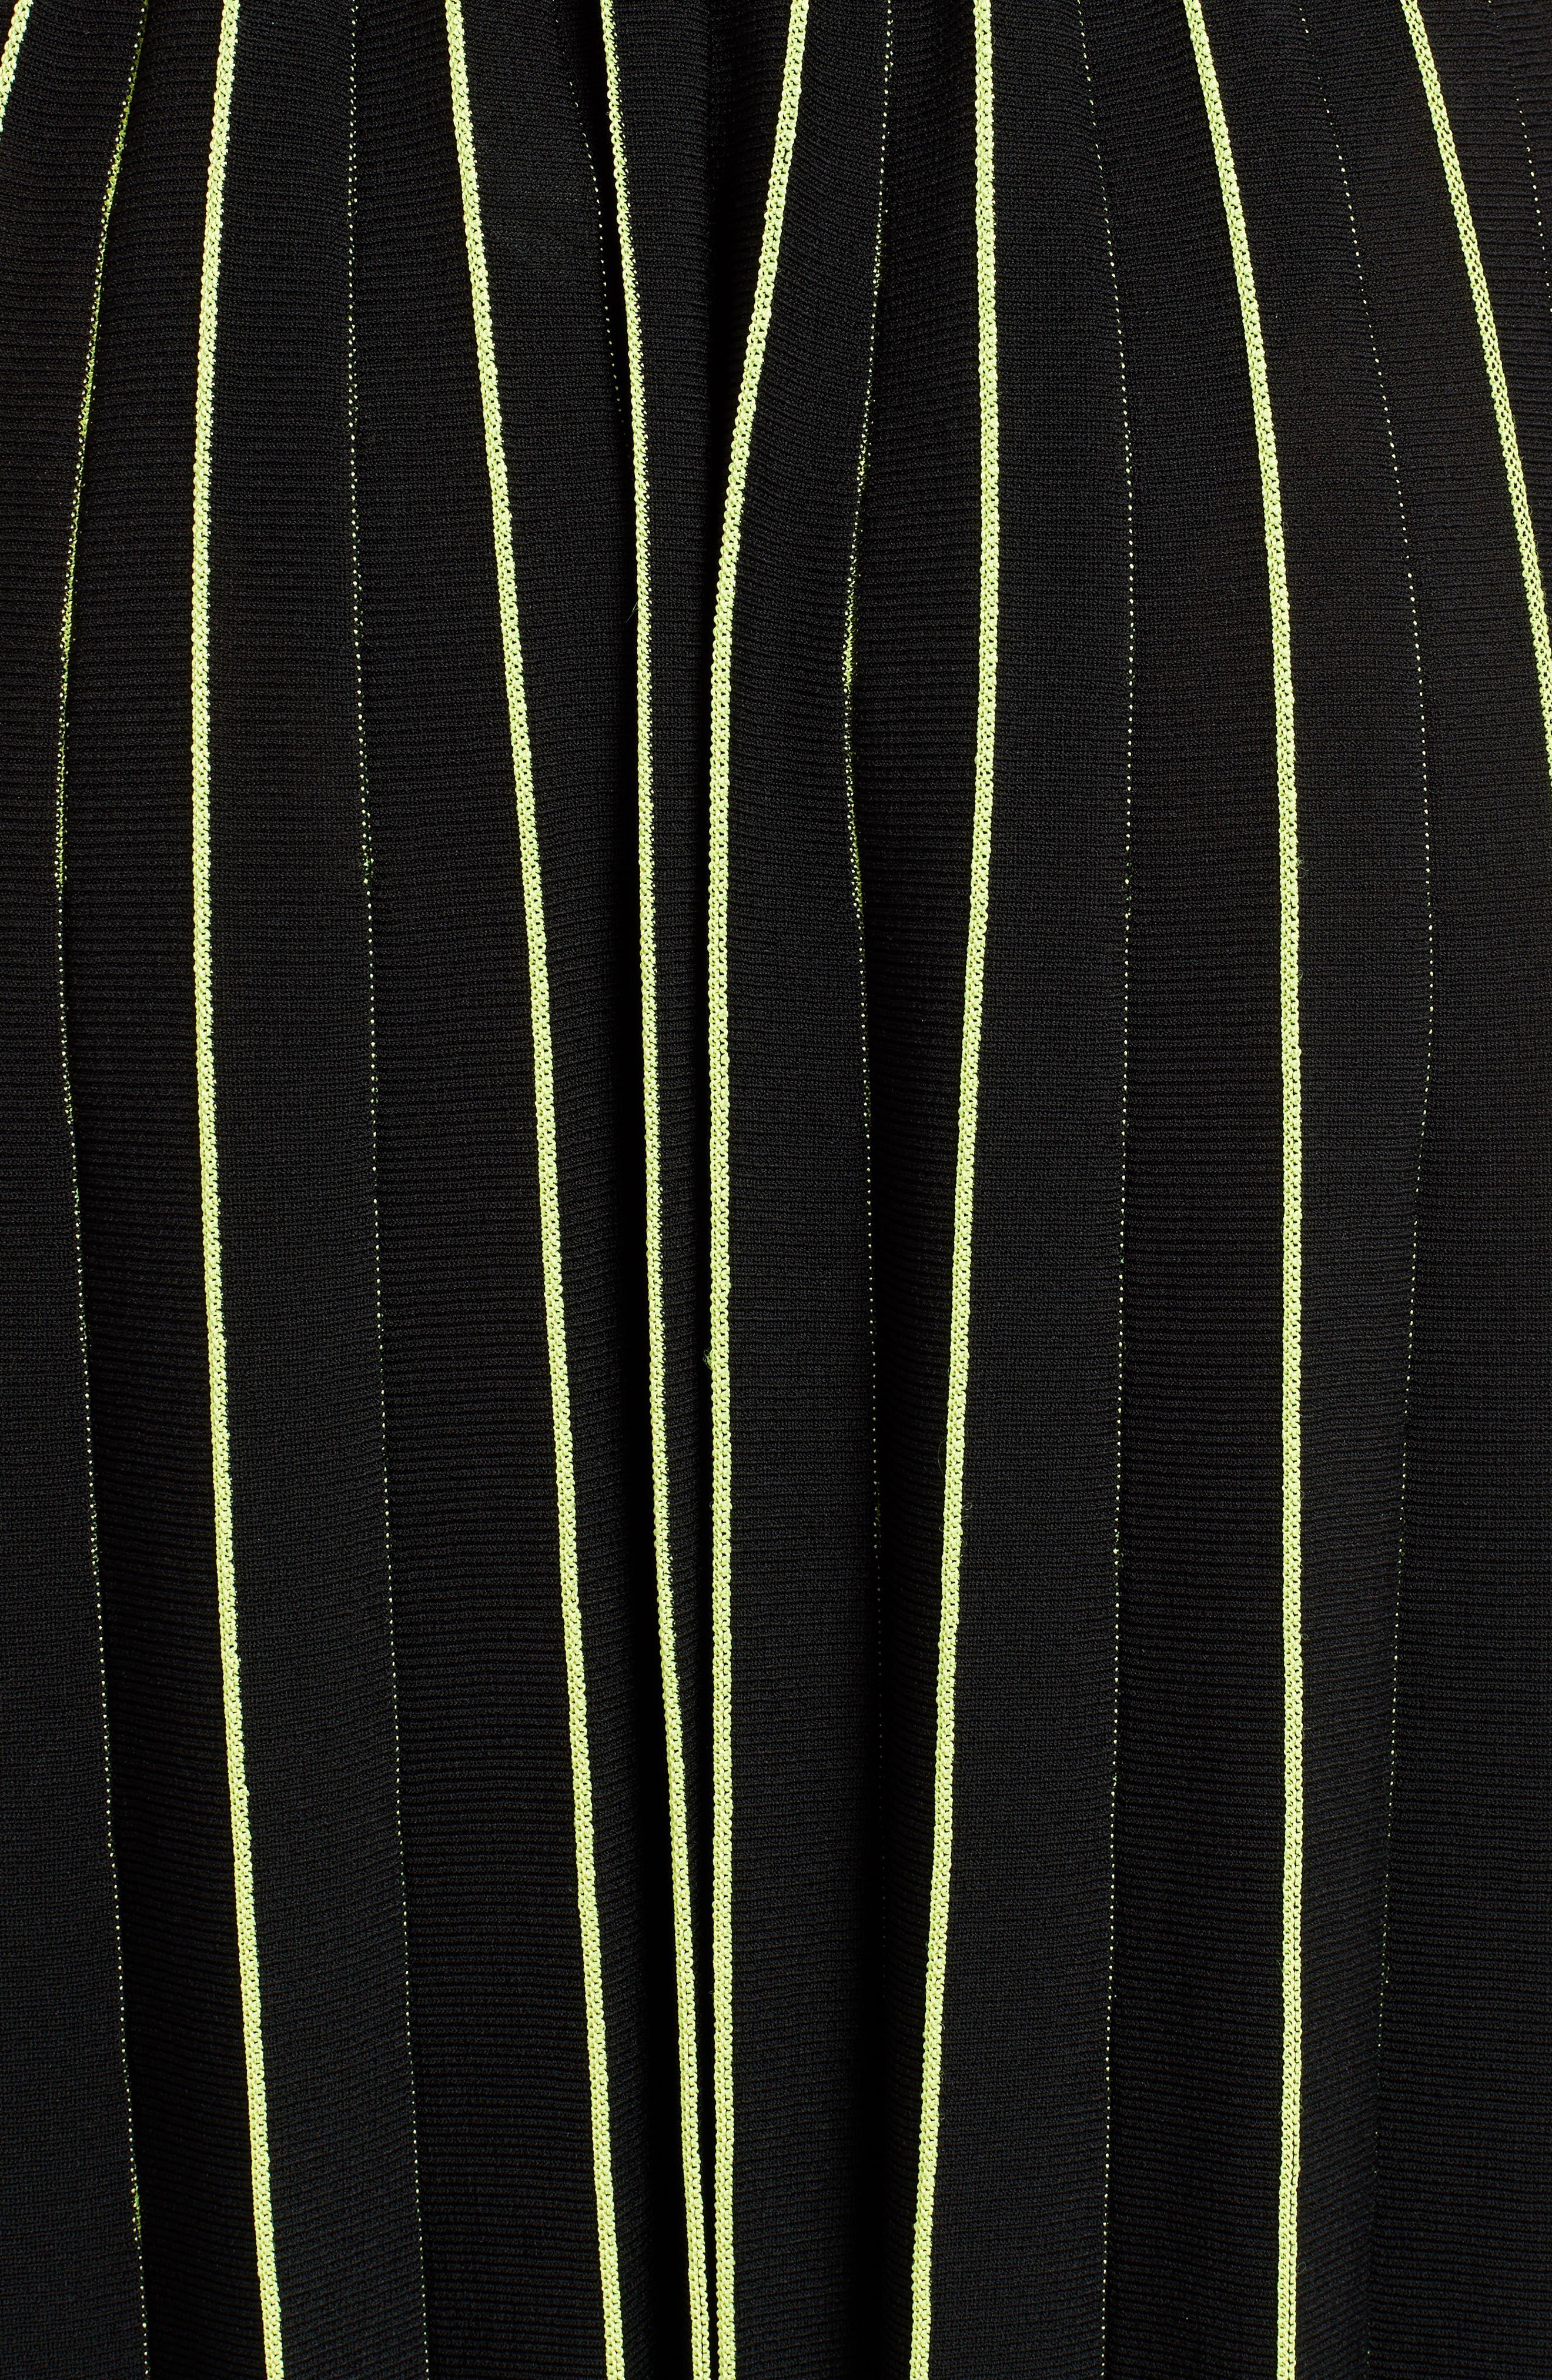 OFF-WHITE, Plissé Sweater Skirt, Alternate thumbnail 5, color, BLACK